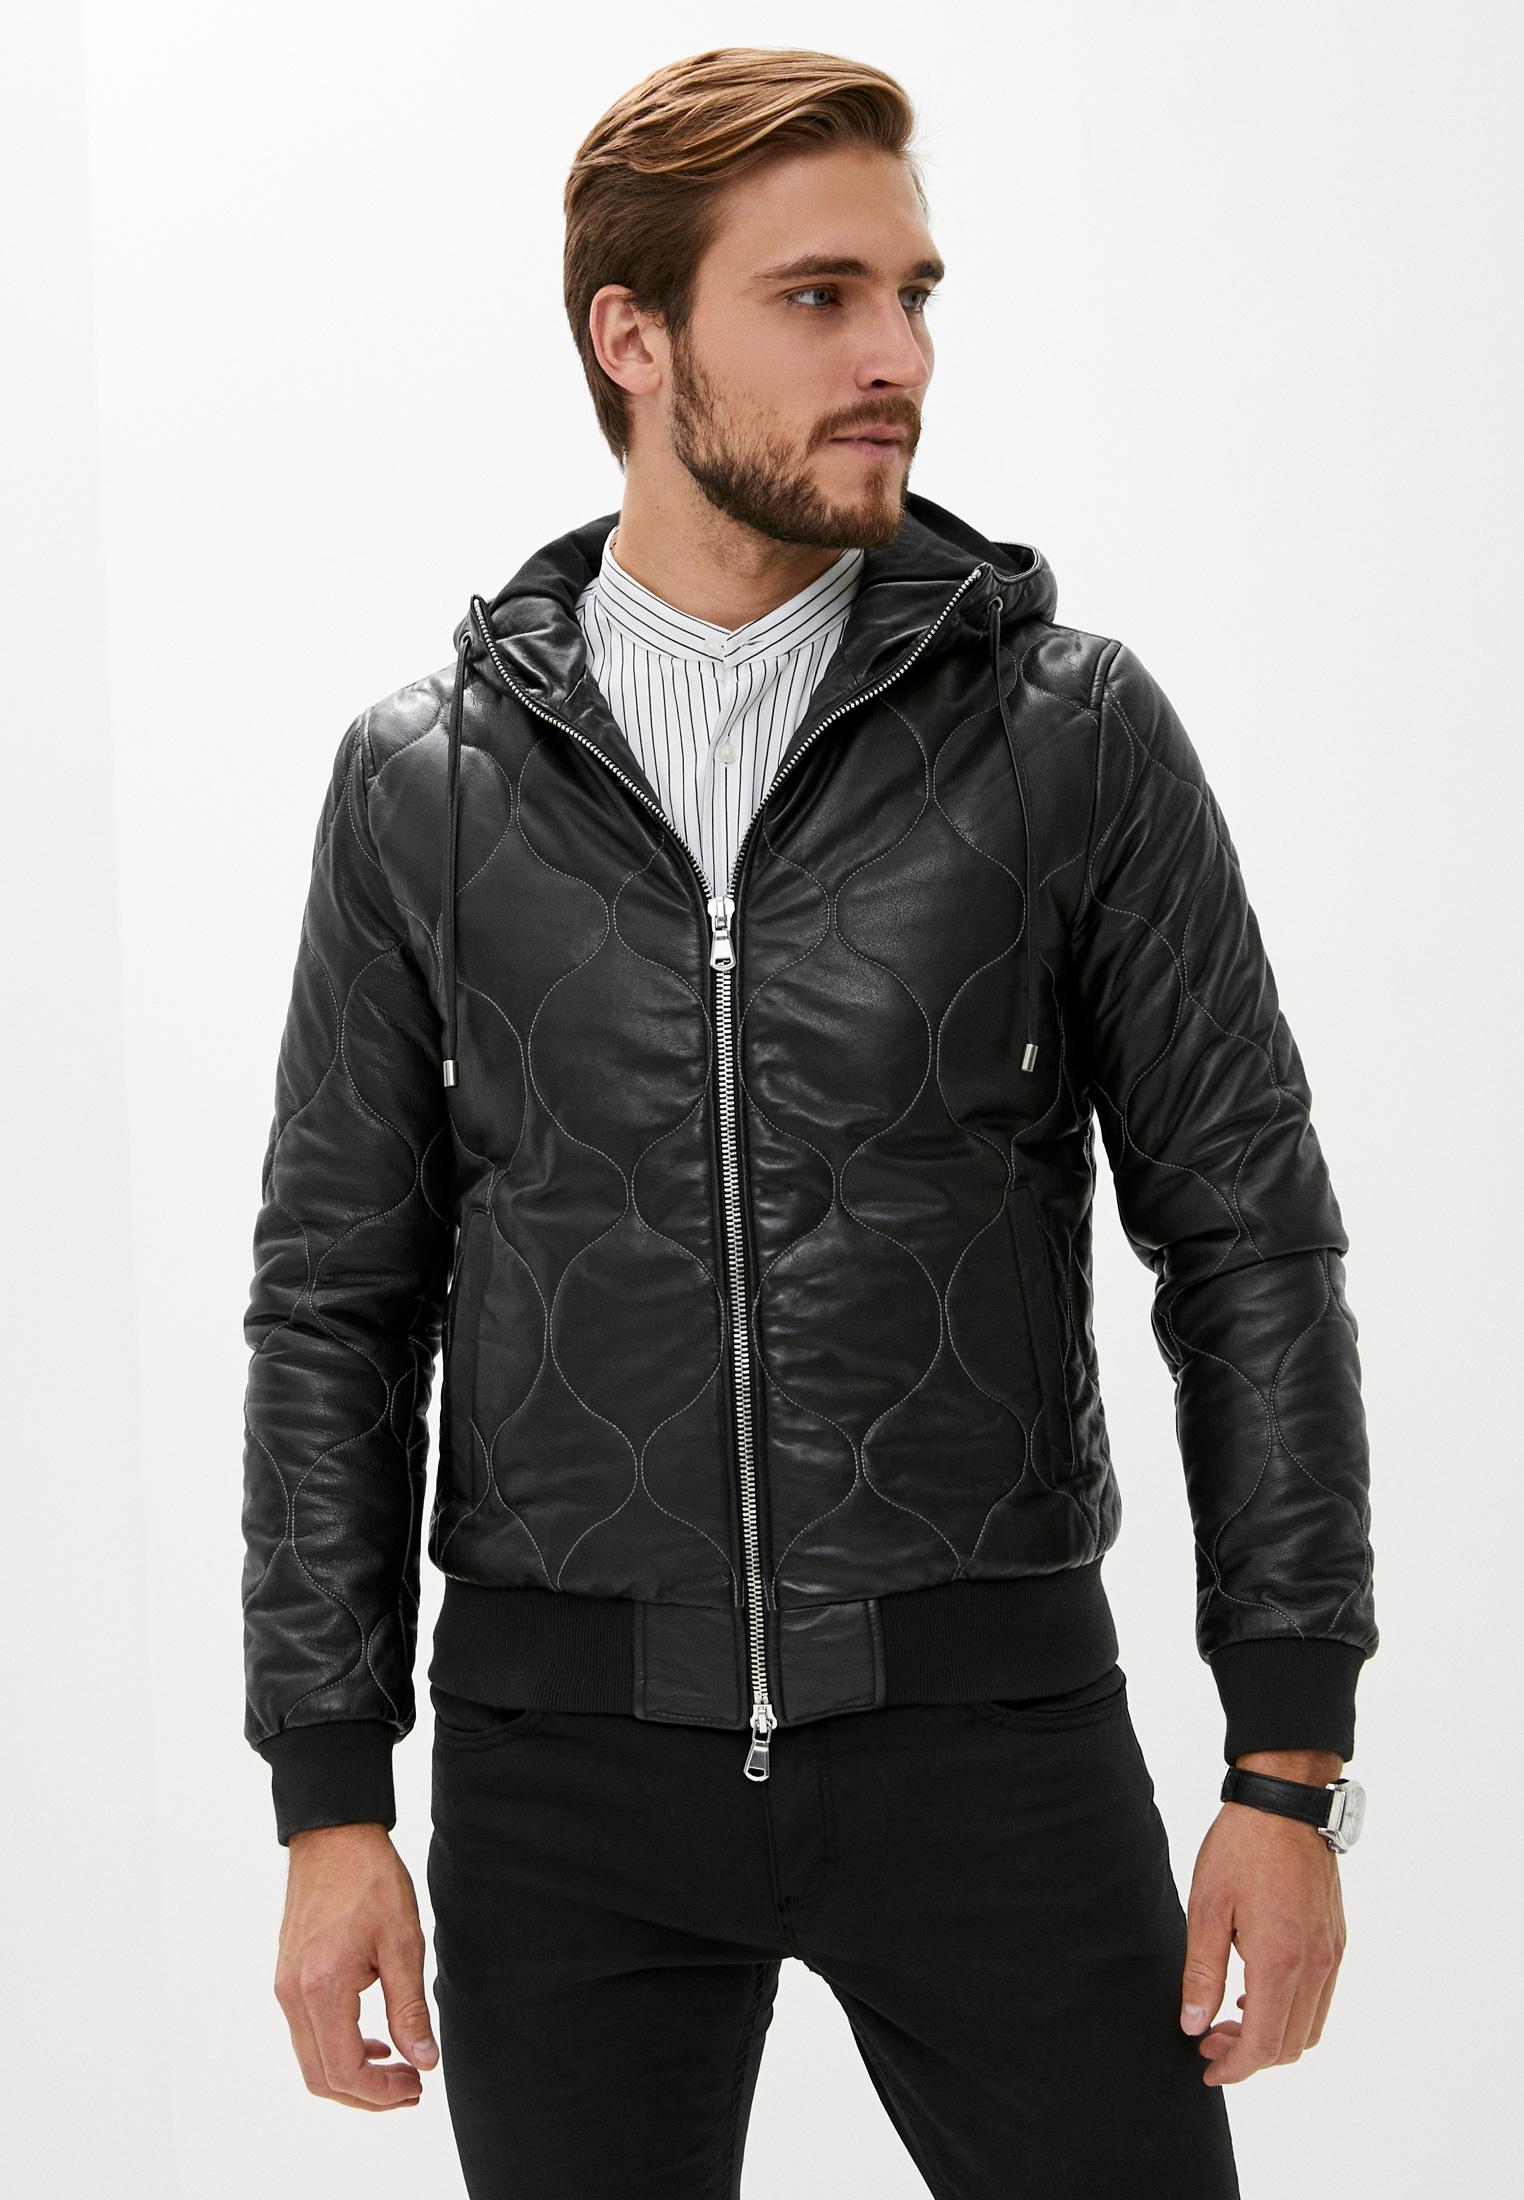 Кожаная куртка Blouson 600nappa roma